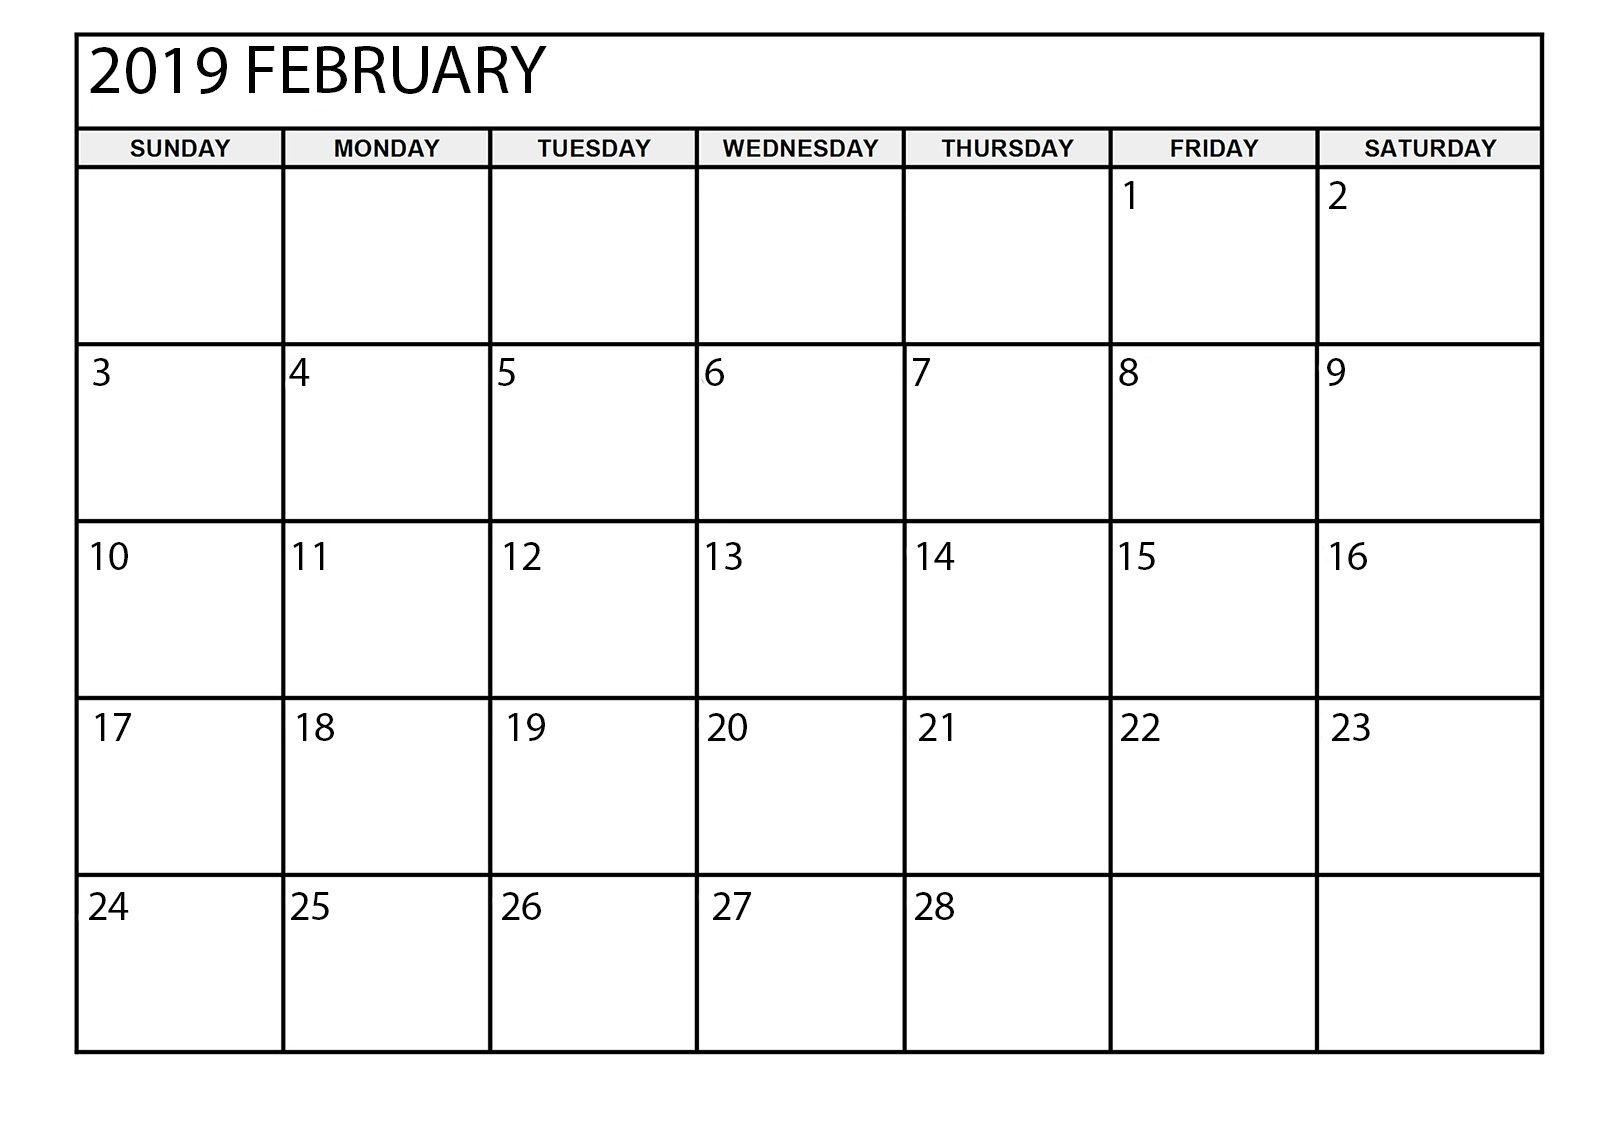 February 2019 Large Calendar February 2019 Calendar Printable Large | February 2019 Calendar